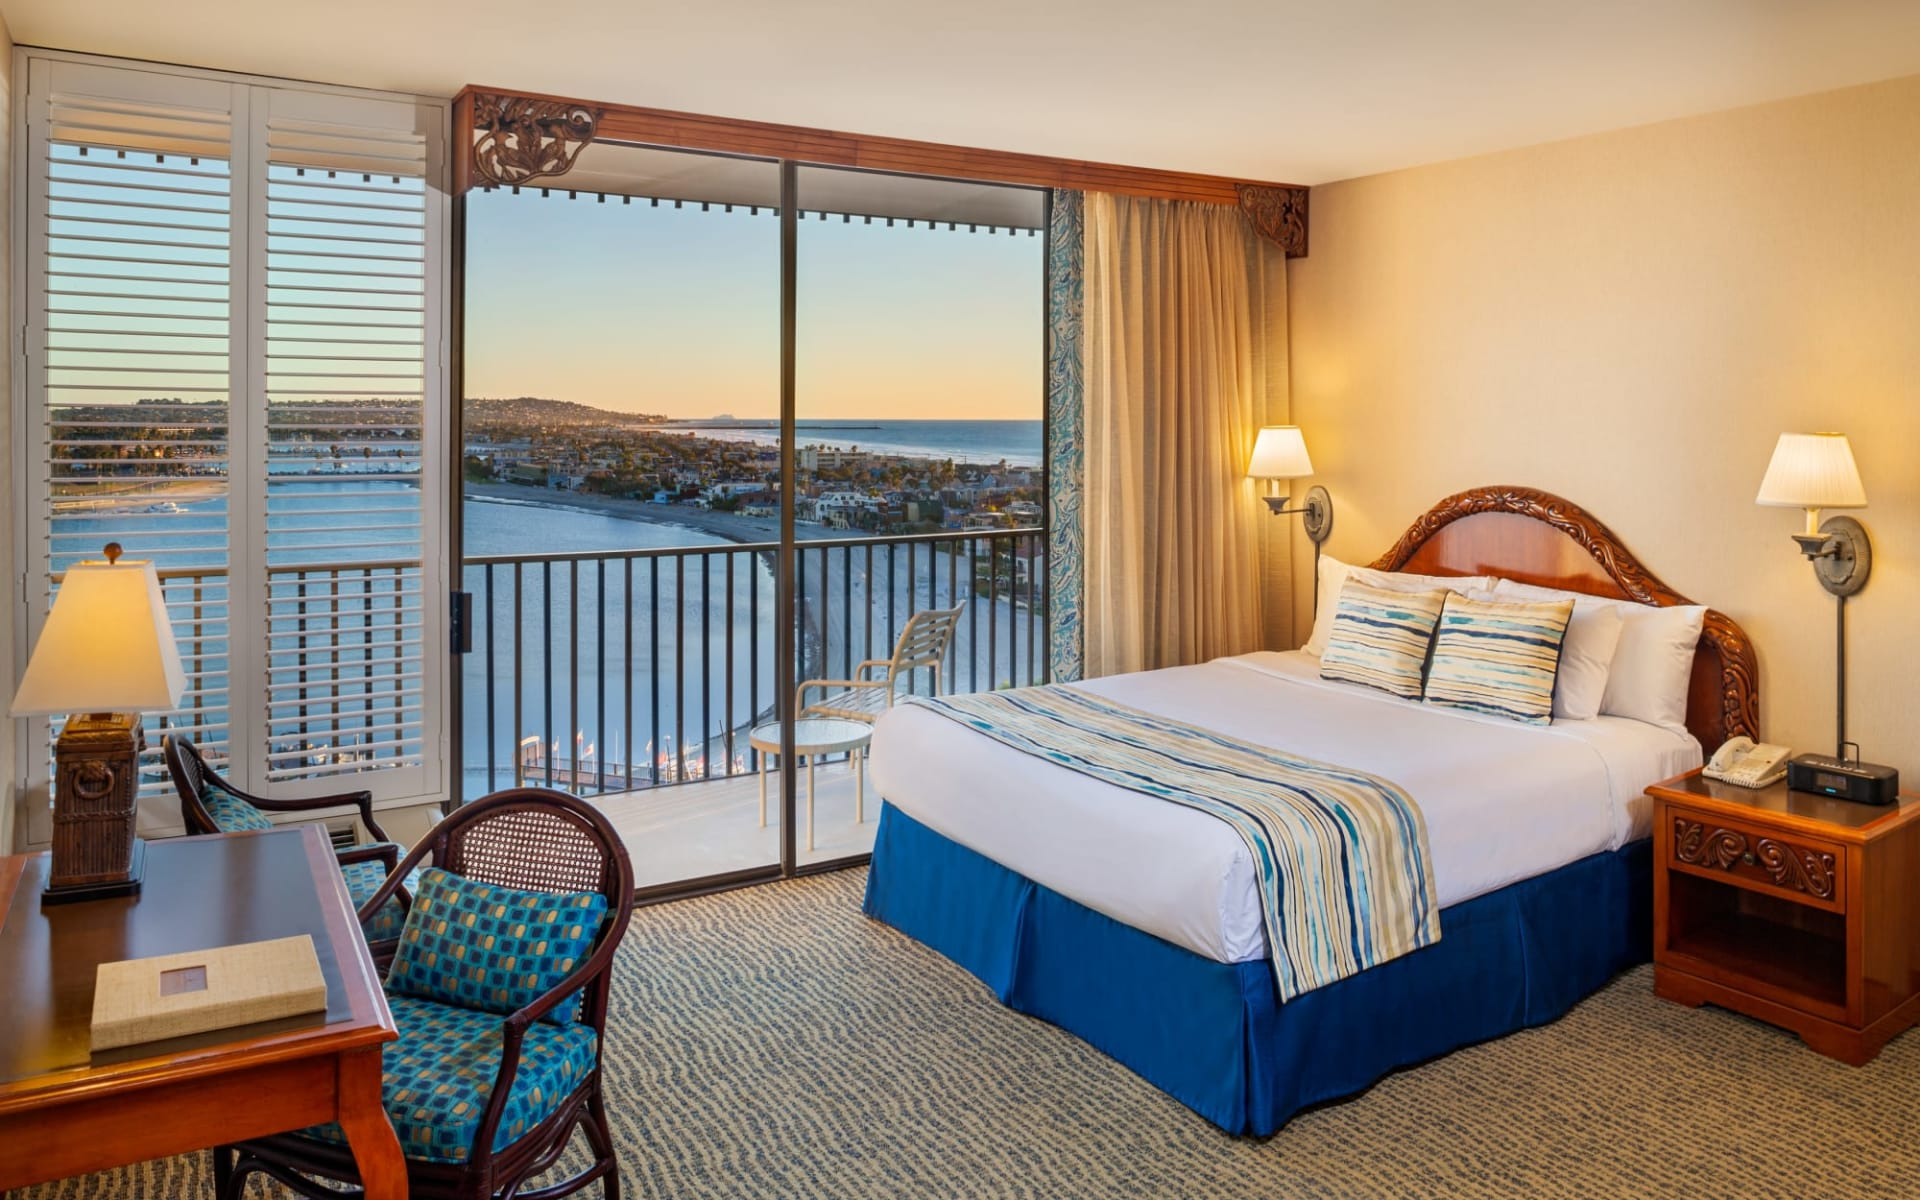 Catamaran Resort & Spa in San Diego:  Catamaran Resort - BayView_King